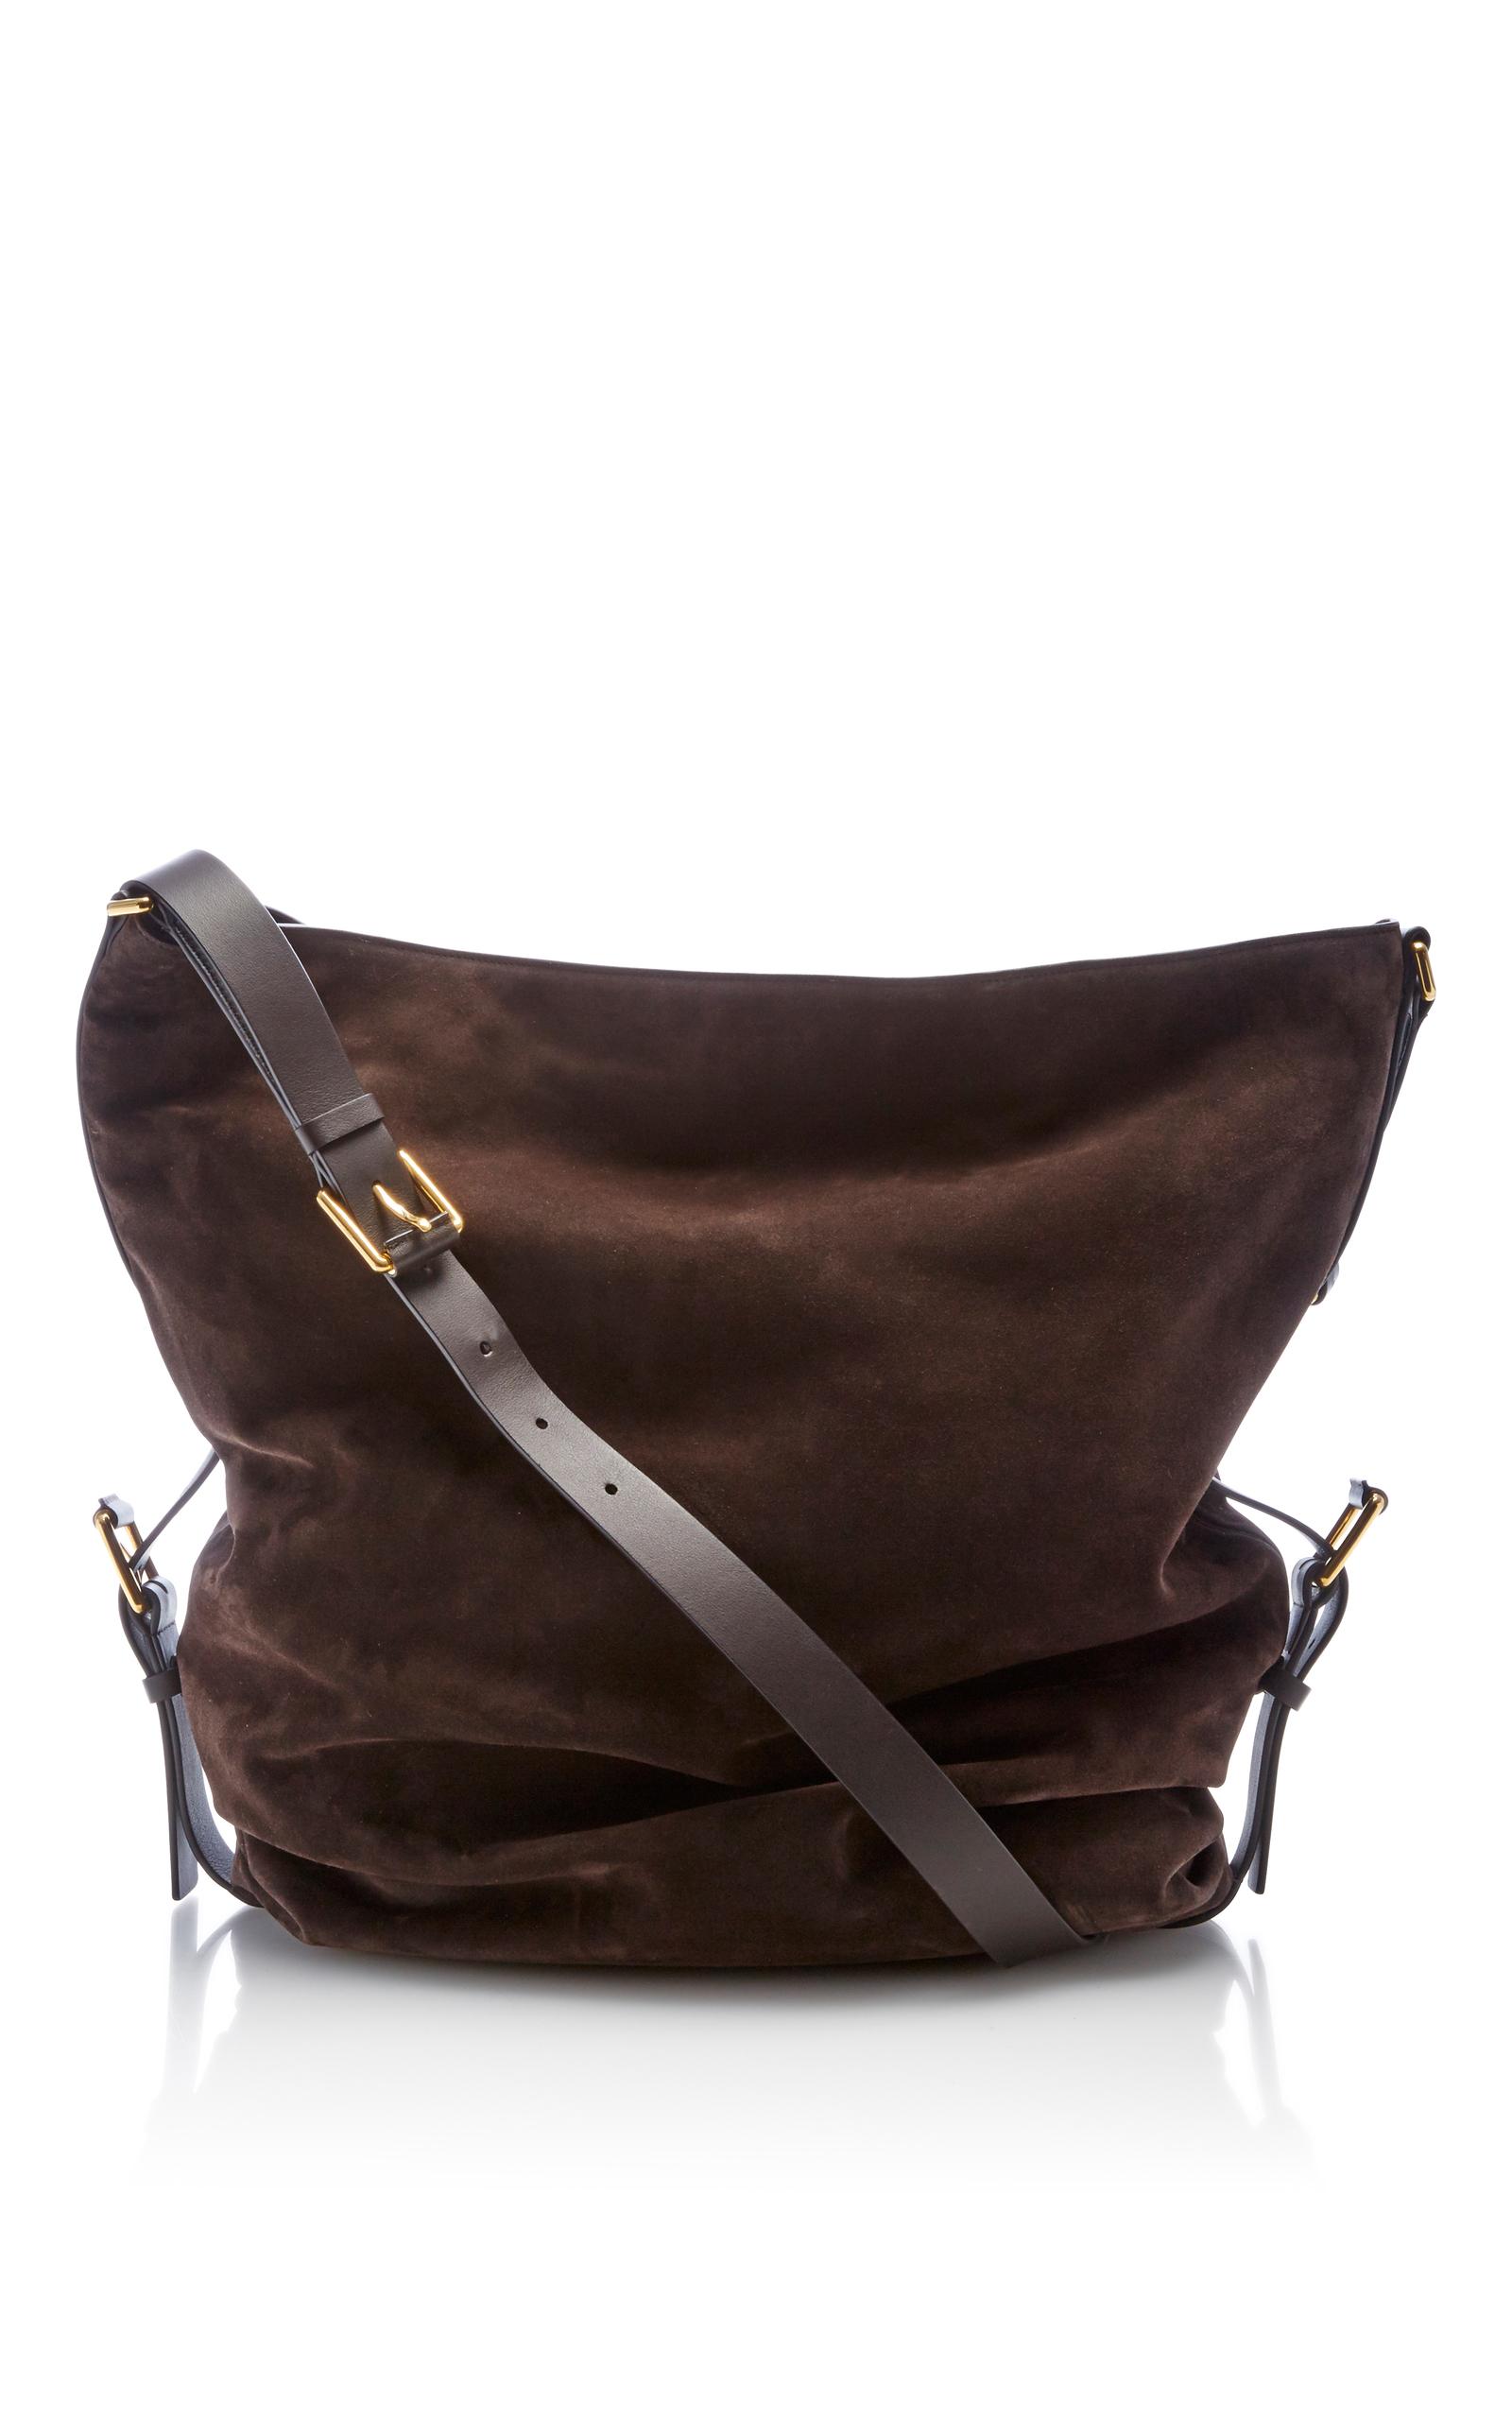 93522154ca45 Michael Kors CollectionLarge Suede Naomi Shoulder Bag. CLOSE. Loading